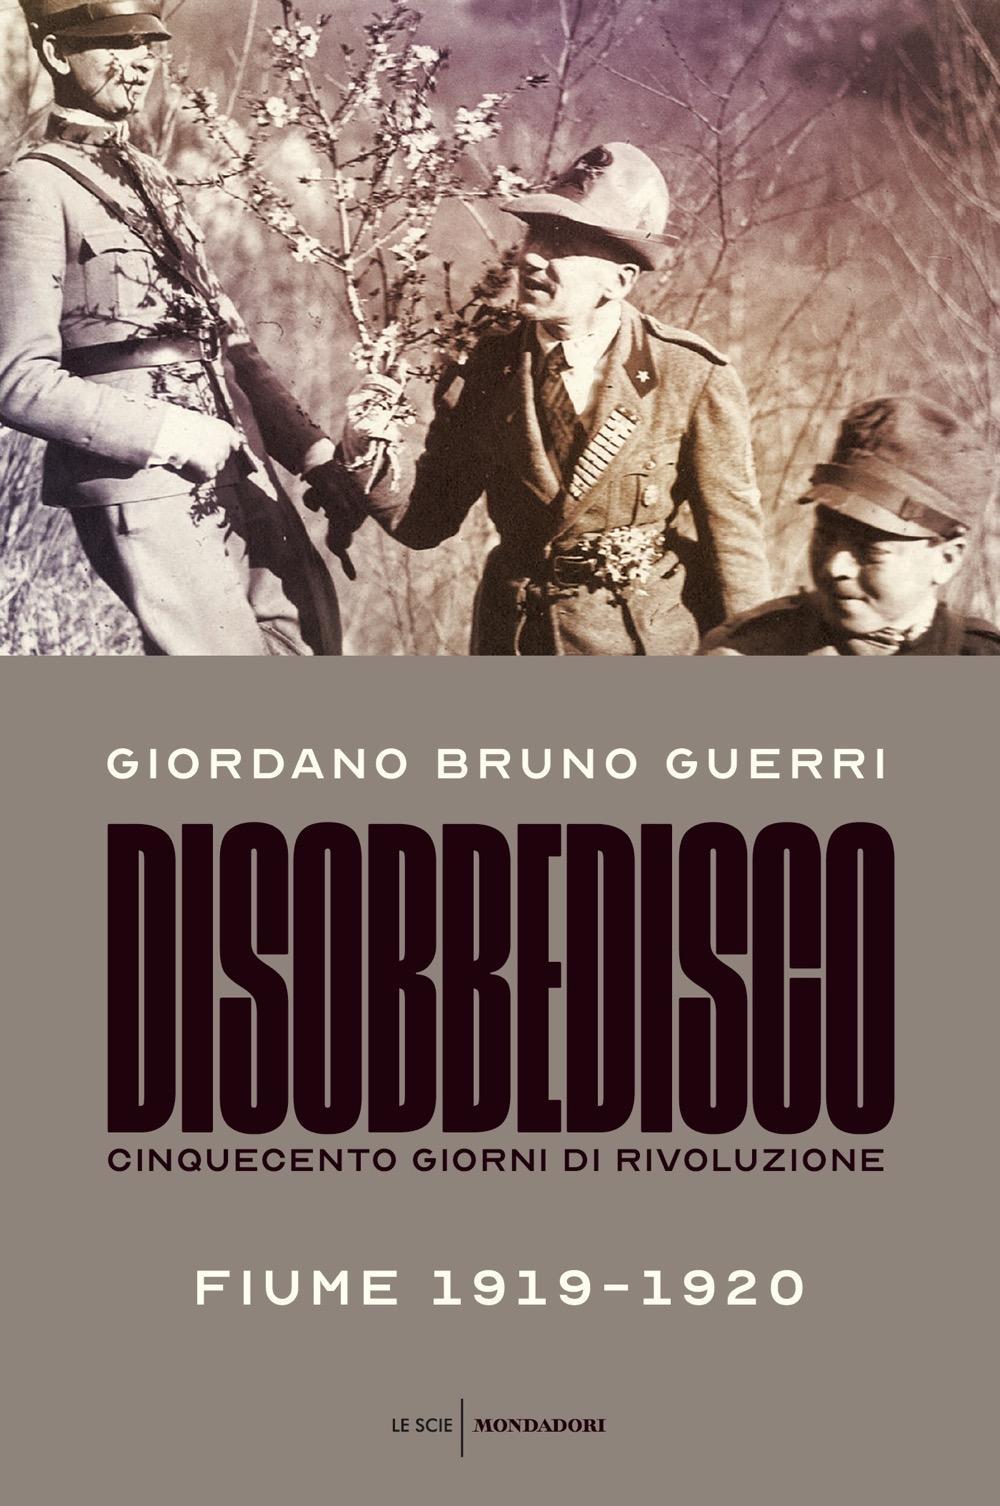 guerri-2019-disobbedisco